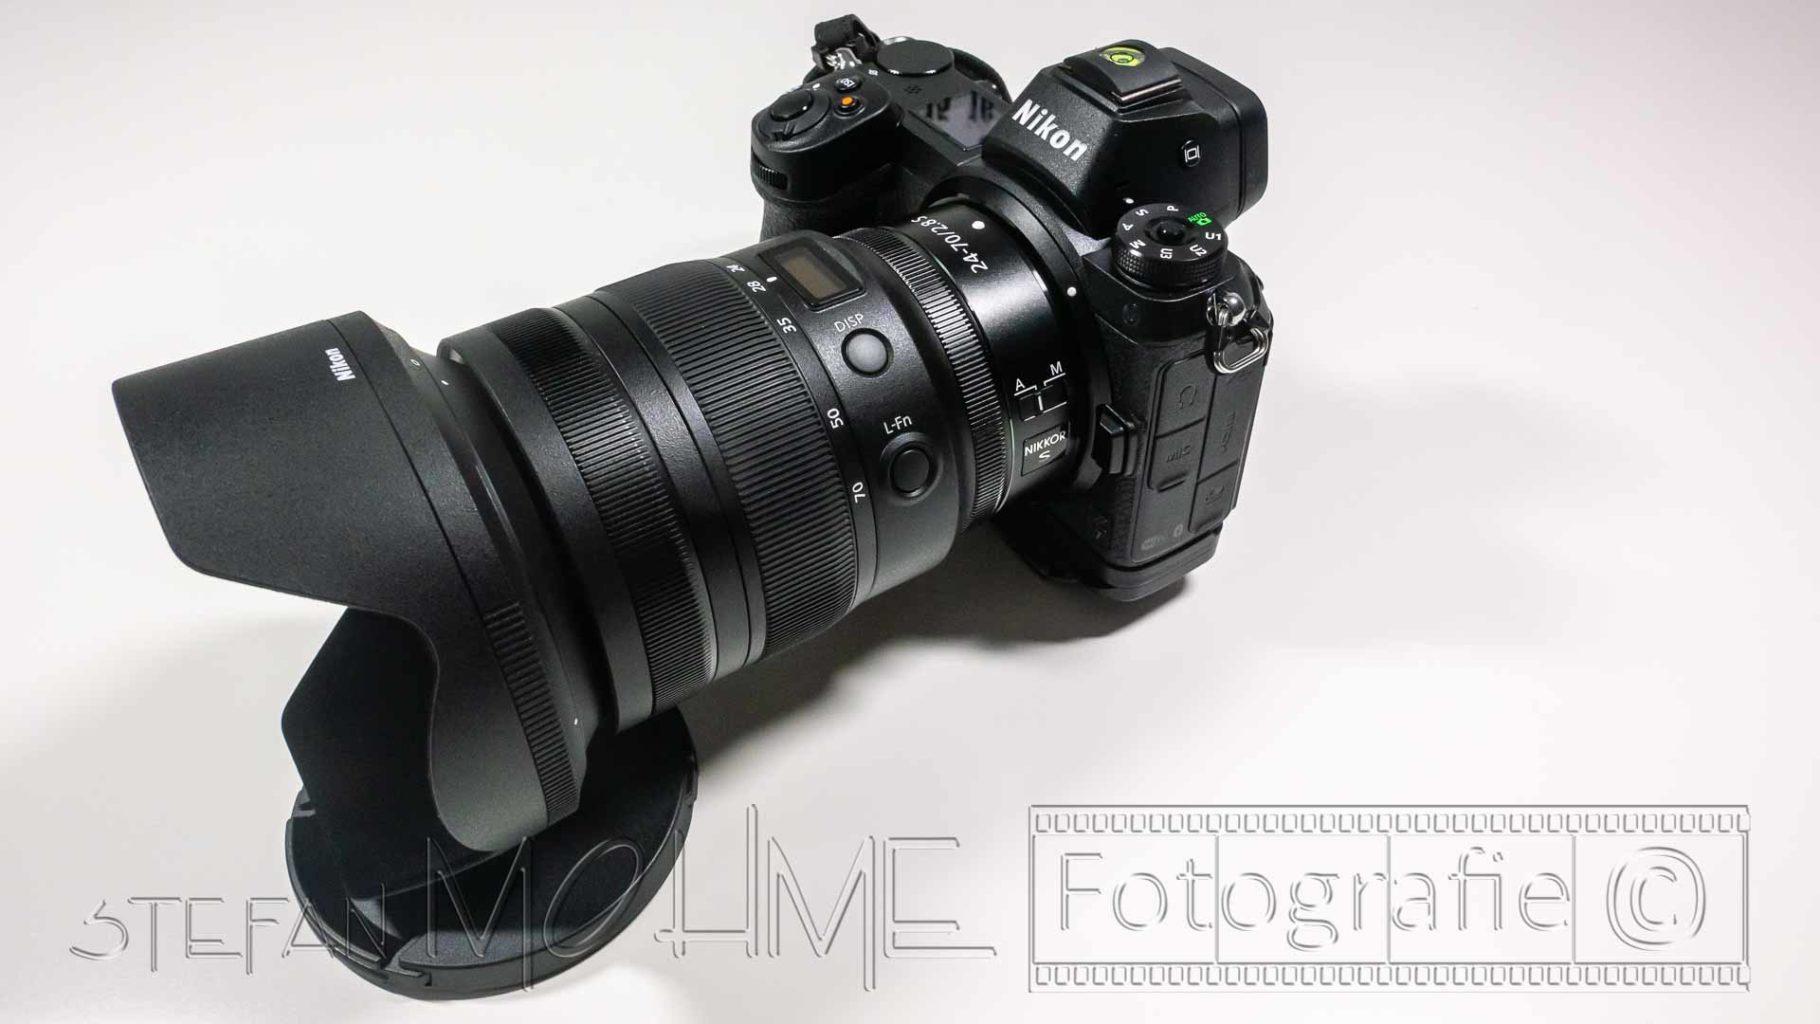 Nikon z7 und 24-70mm F/2,8 Objektiv